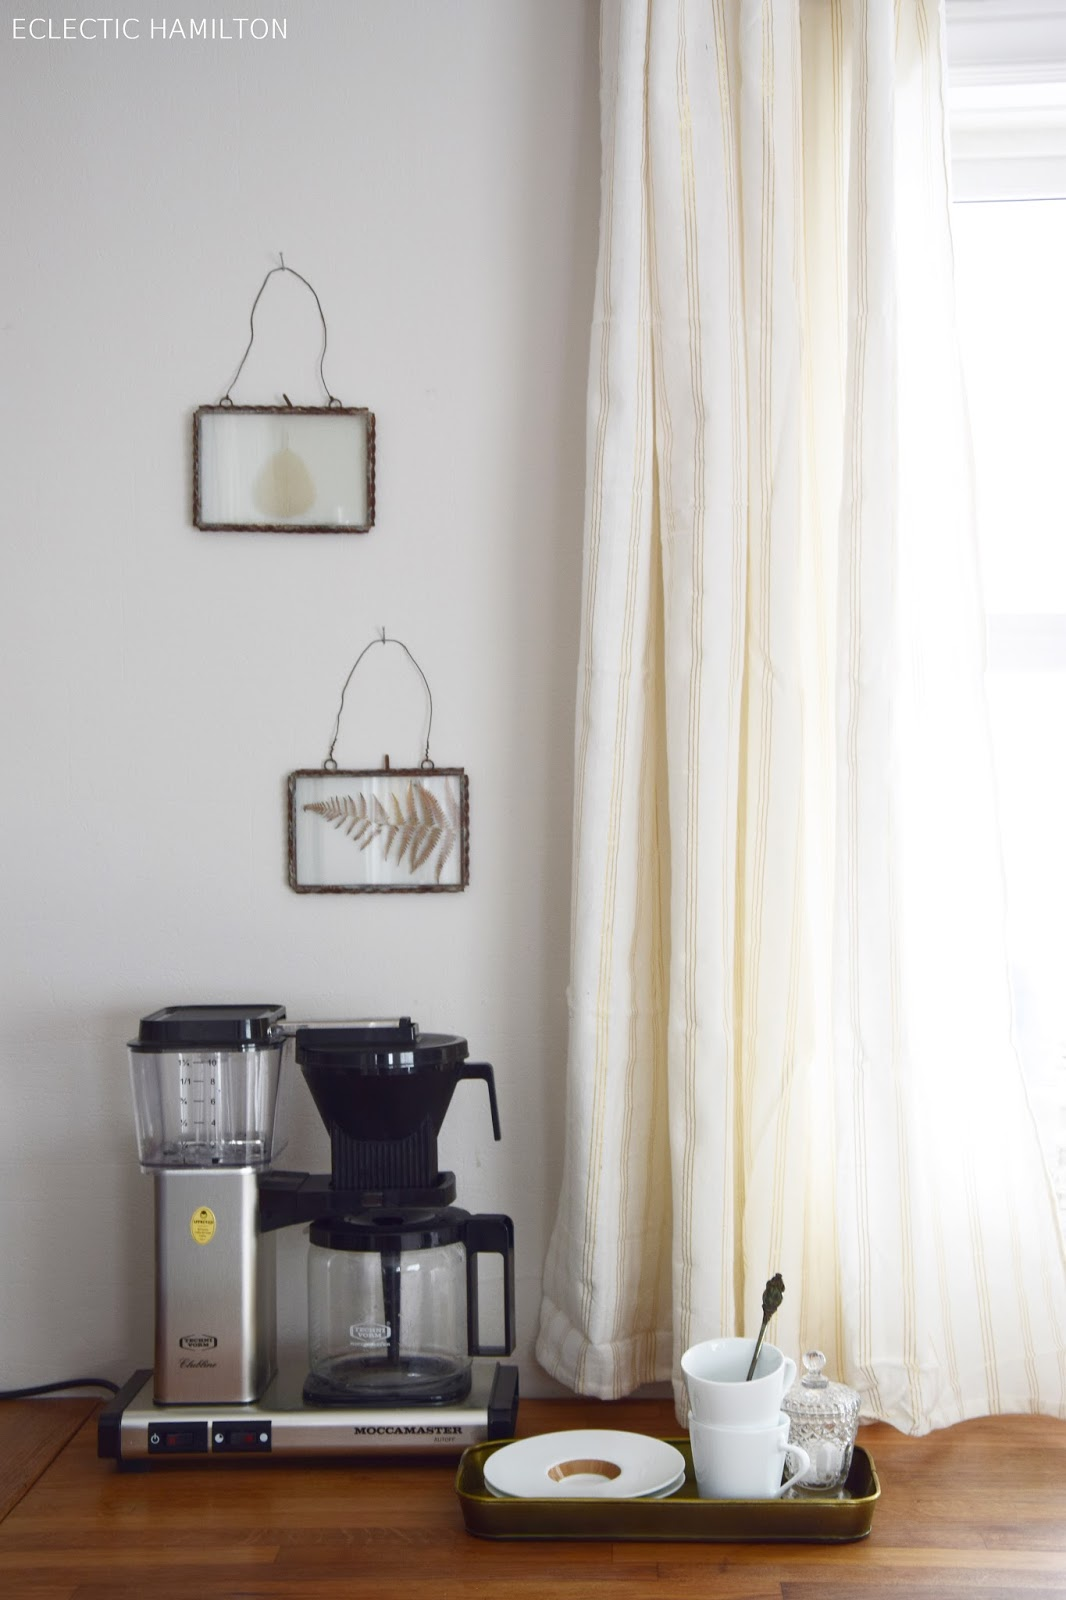 gardinen f r dachfenster selber n hen wohn design. Black Bedroom Furniture Sets. Home Design Ideas